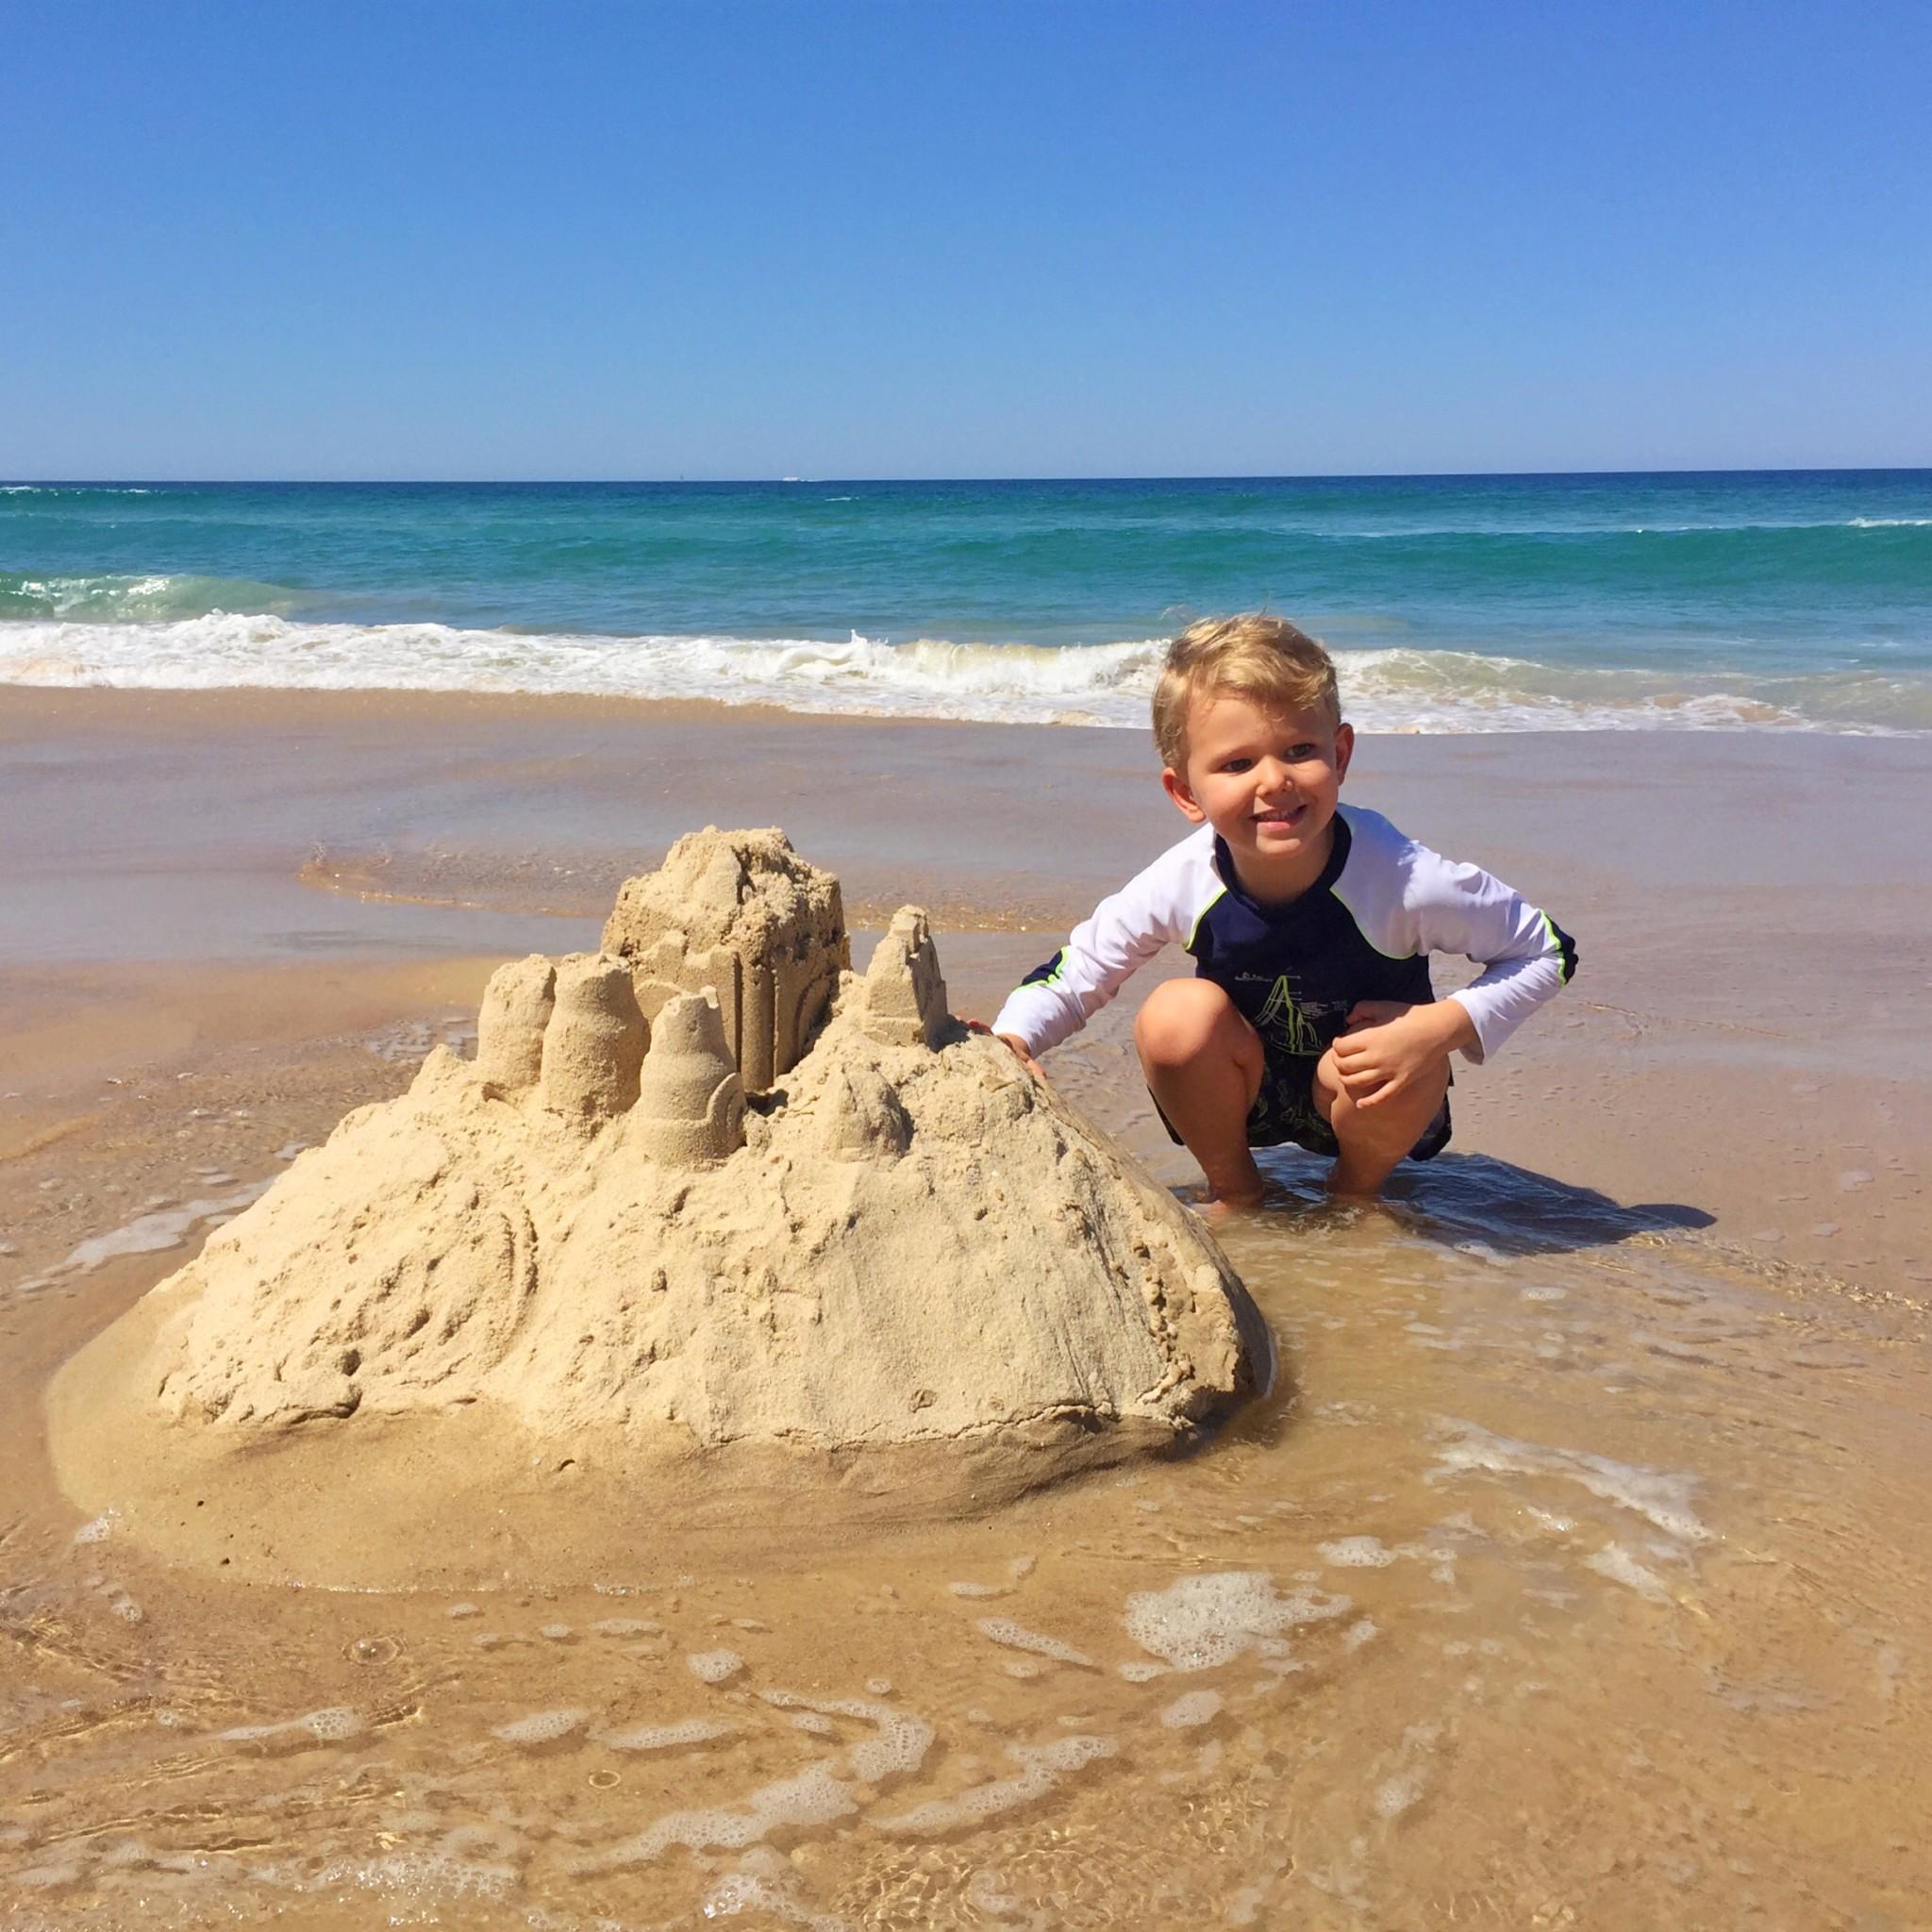 Simple pleasures-family-gold coast